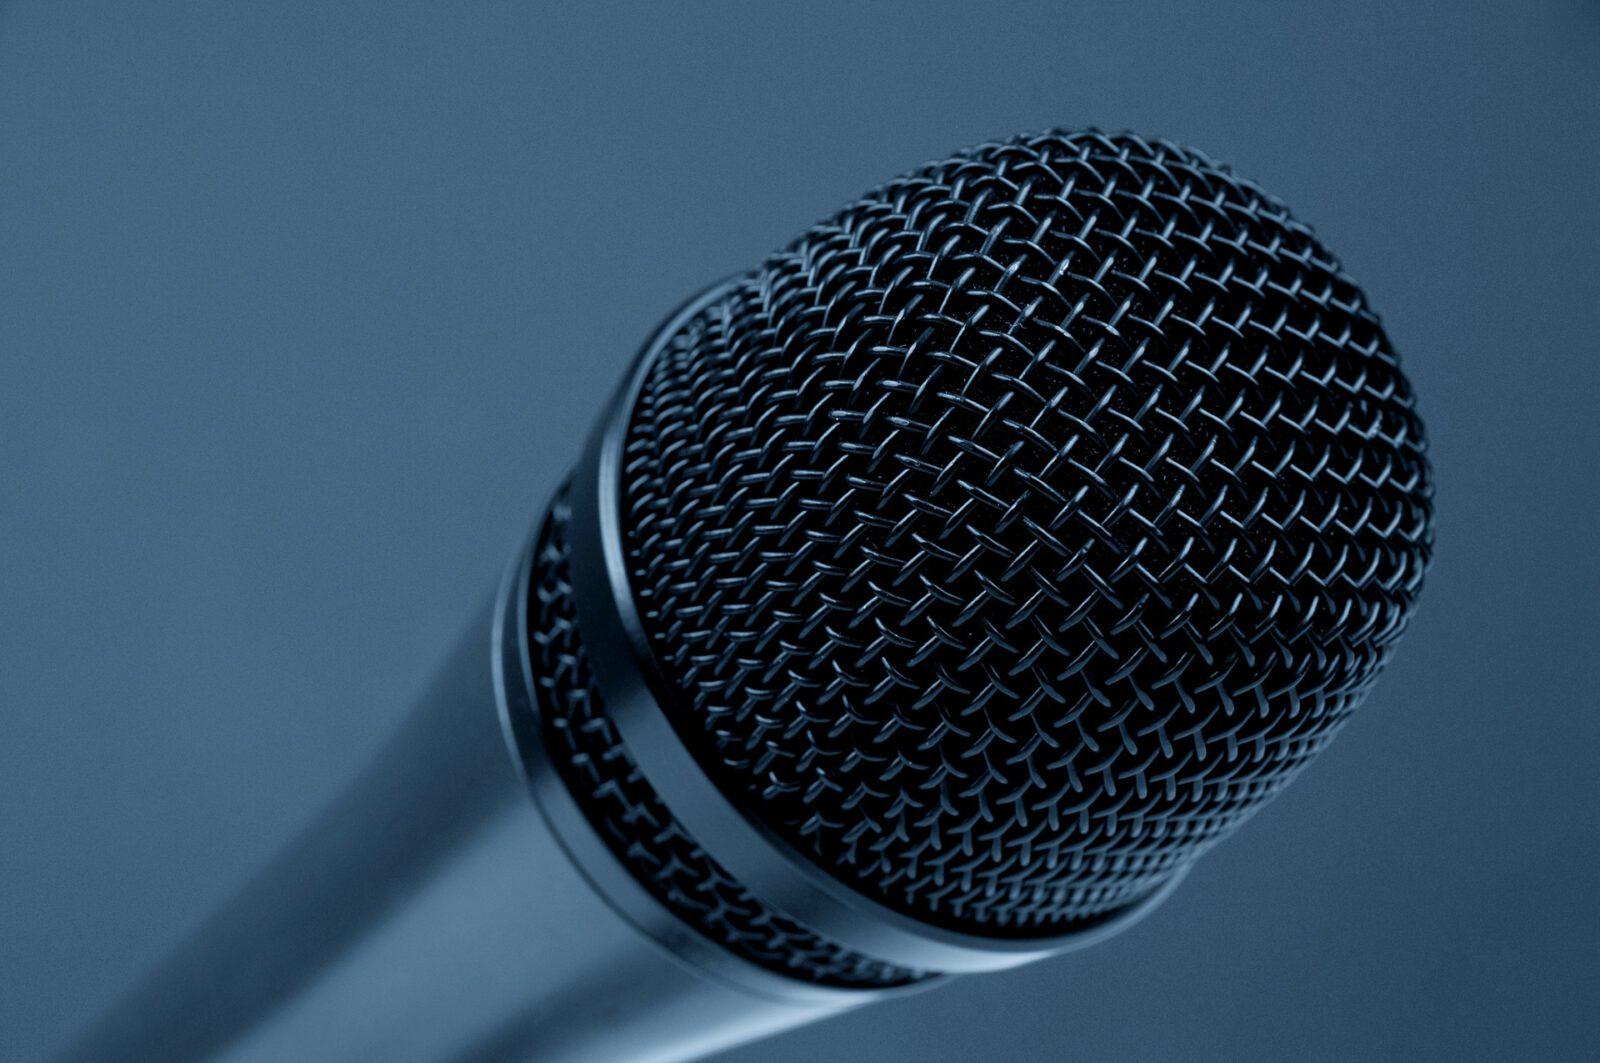 vorträge, speaker, keynote